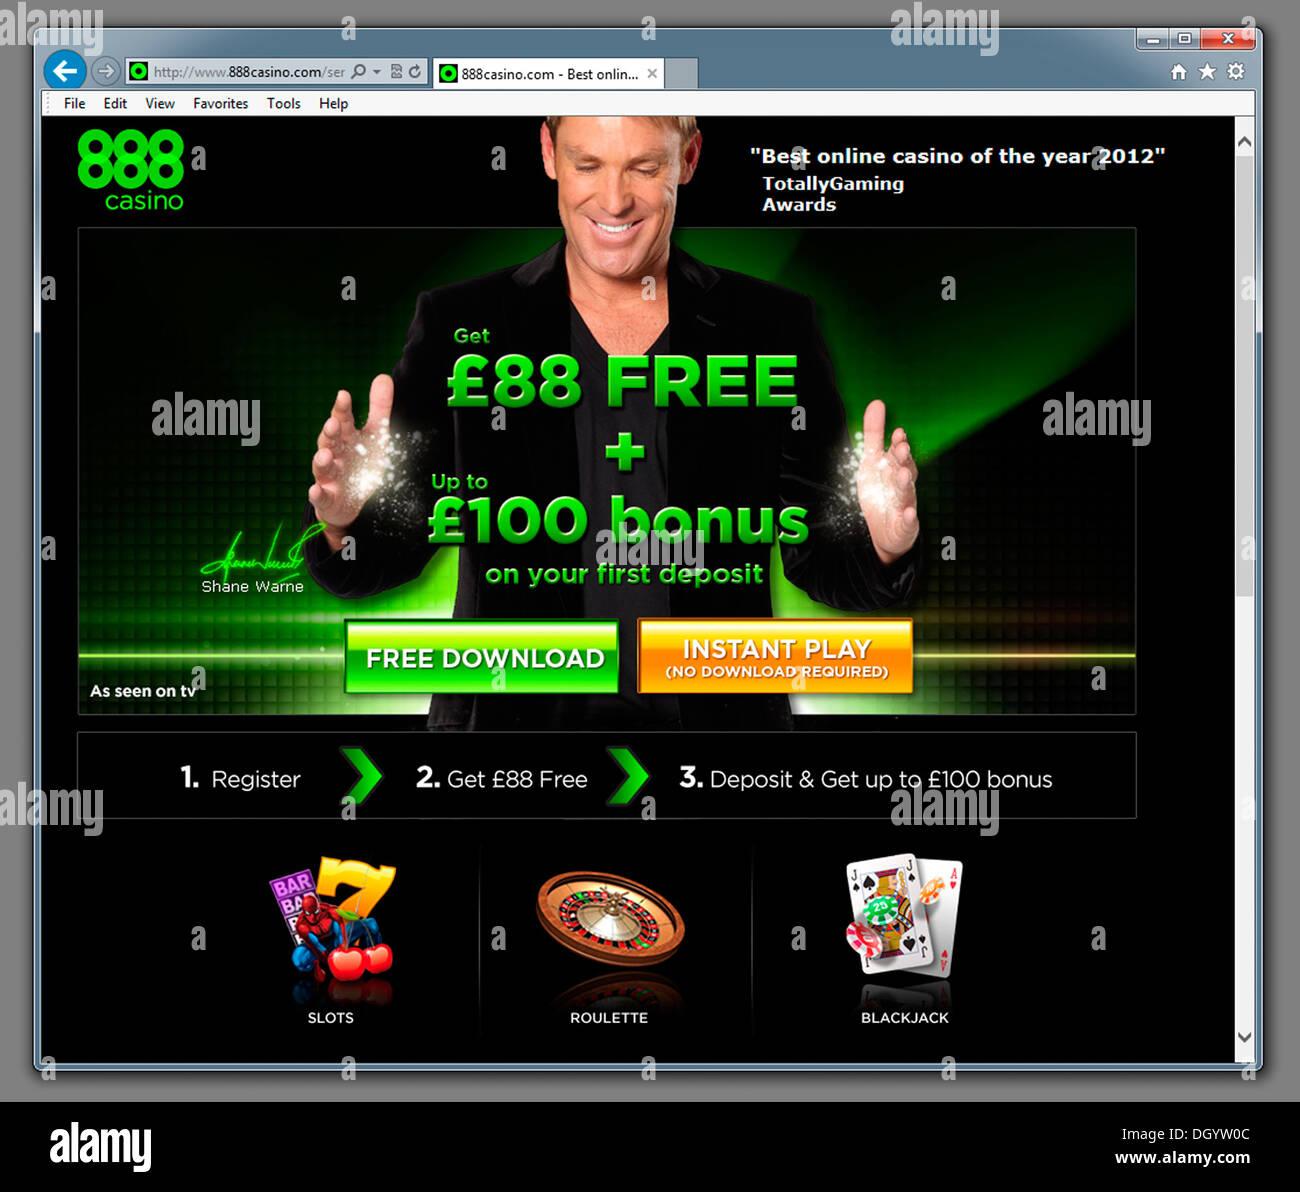 888 Casino Gambling Website. - Stock Image